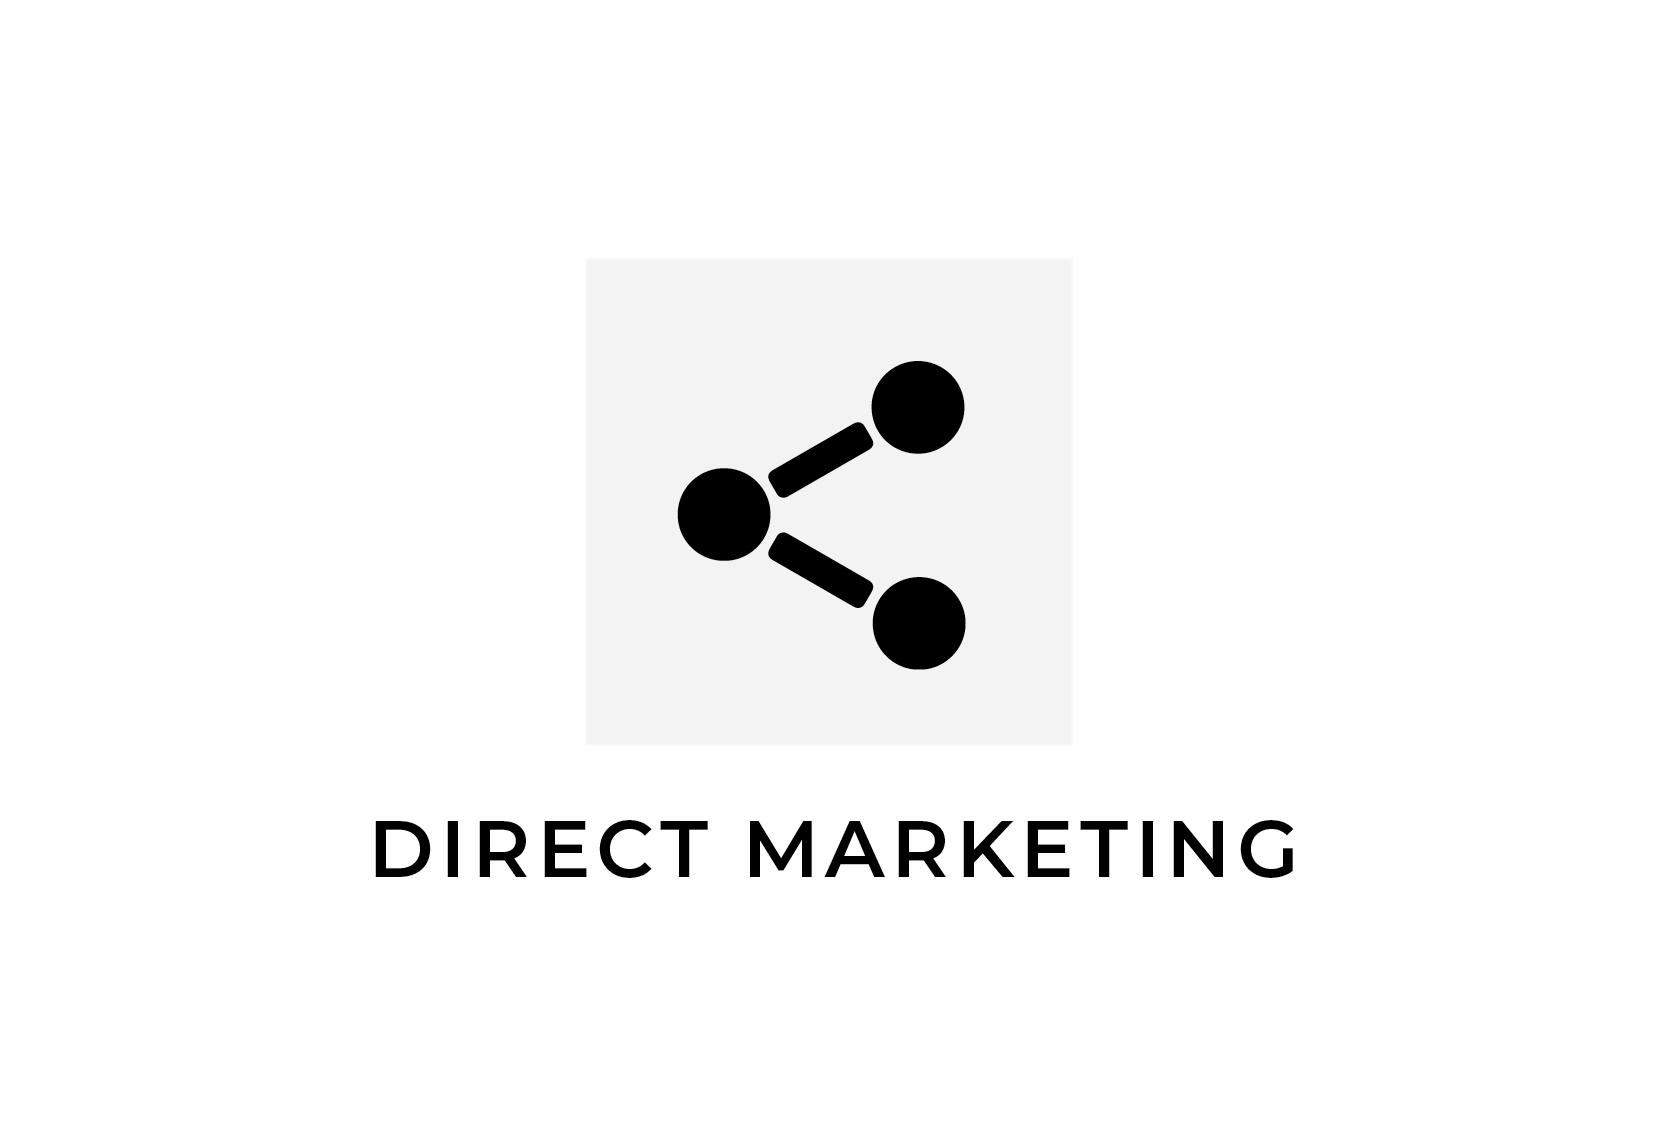 DirectMarketing.jpg